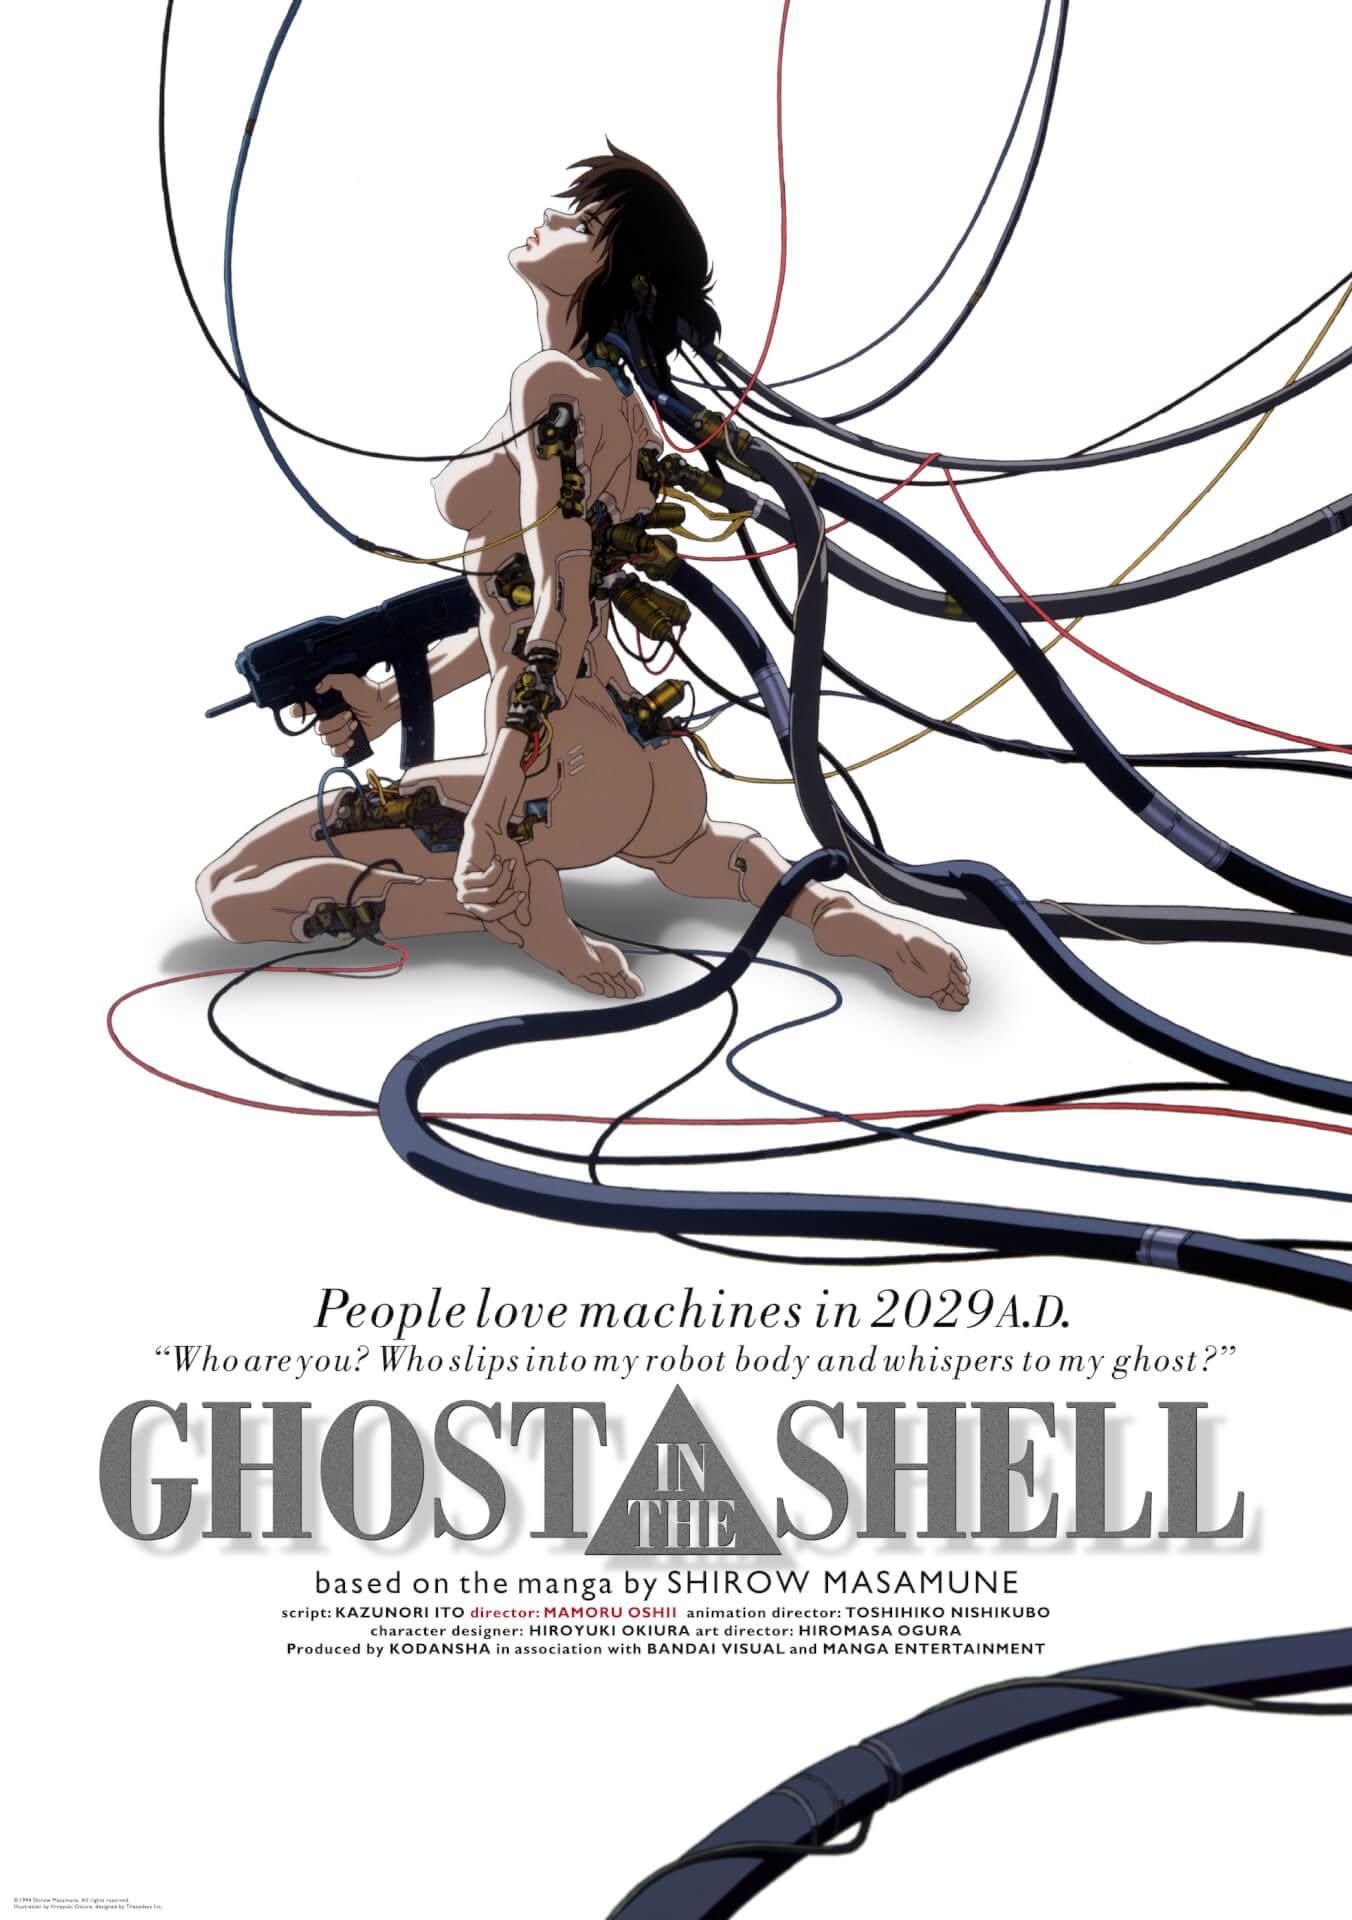 『GHOST IN THE SHELL/攻殻機動隊』4Kリマスター版公開記念!トリビュートビジュアル4点が解禁 film210916_ghostintheshell_2